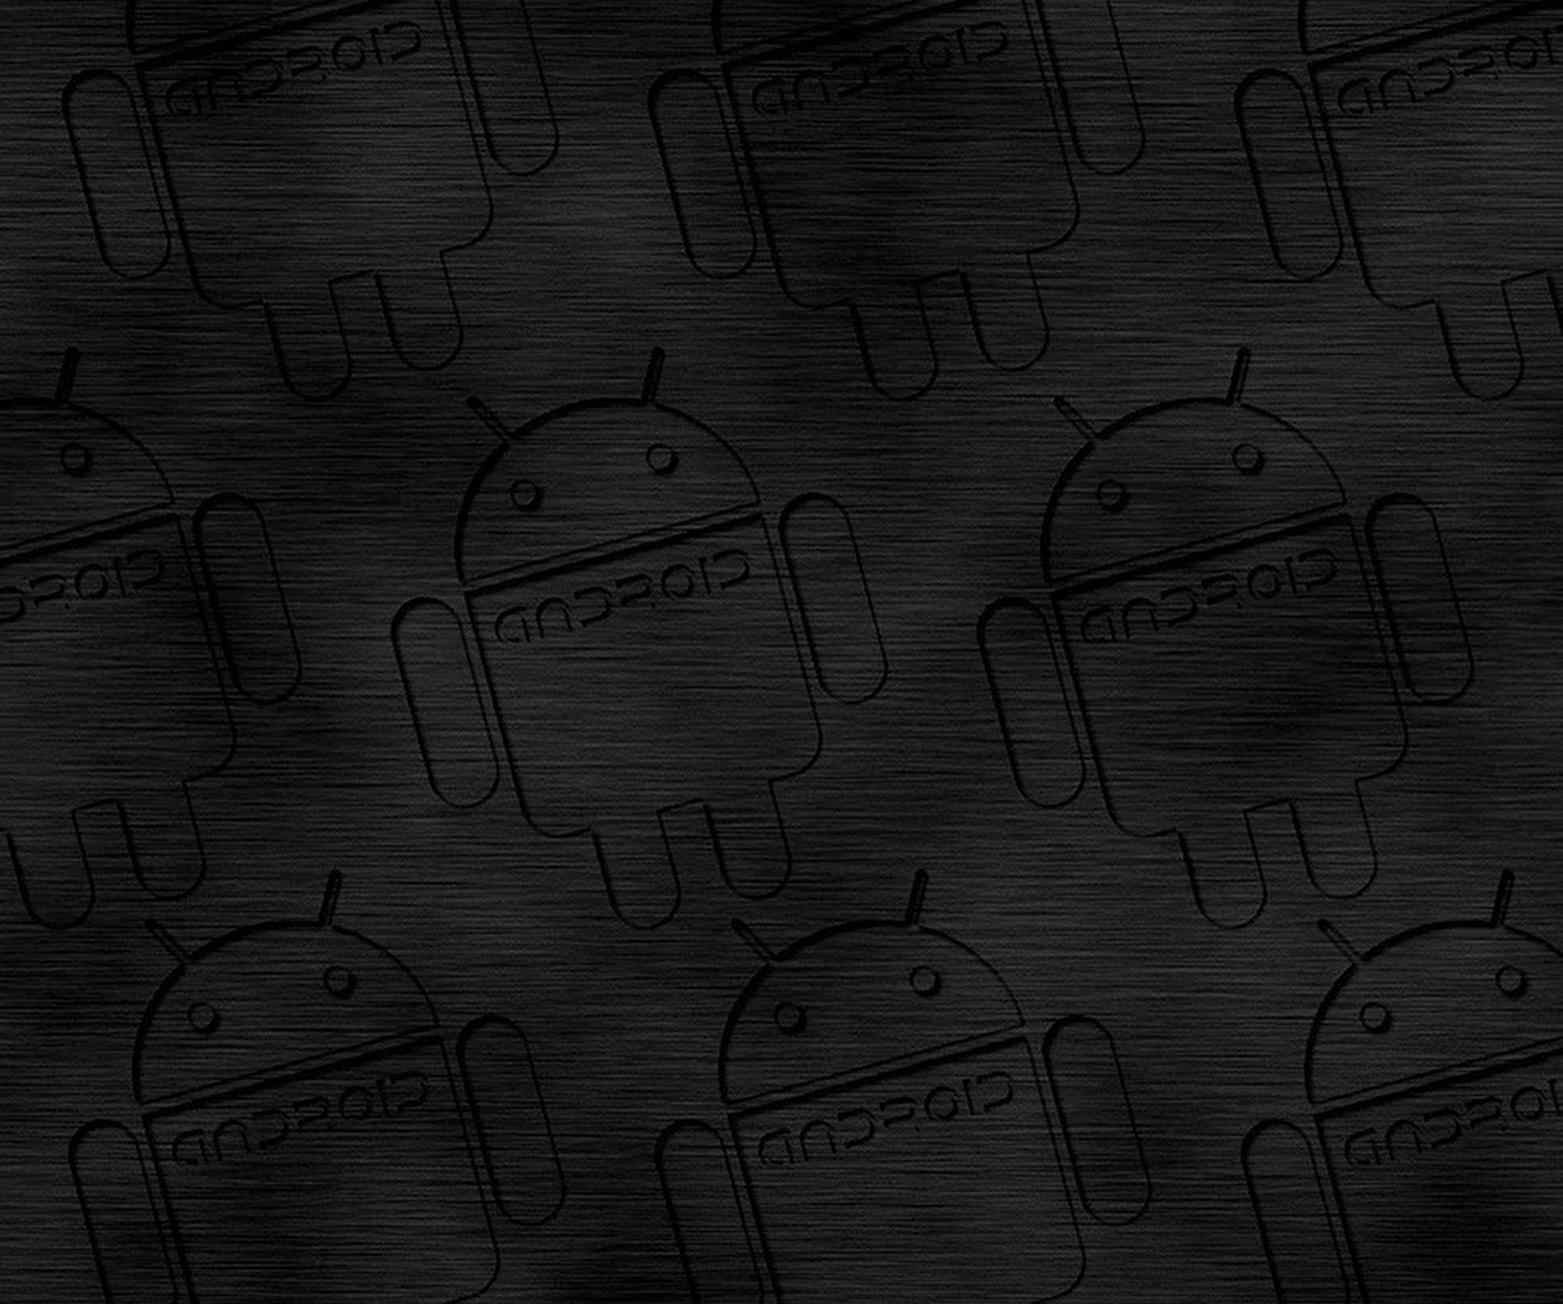 android phone wallpaper 162 | wallpapertp